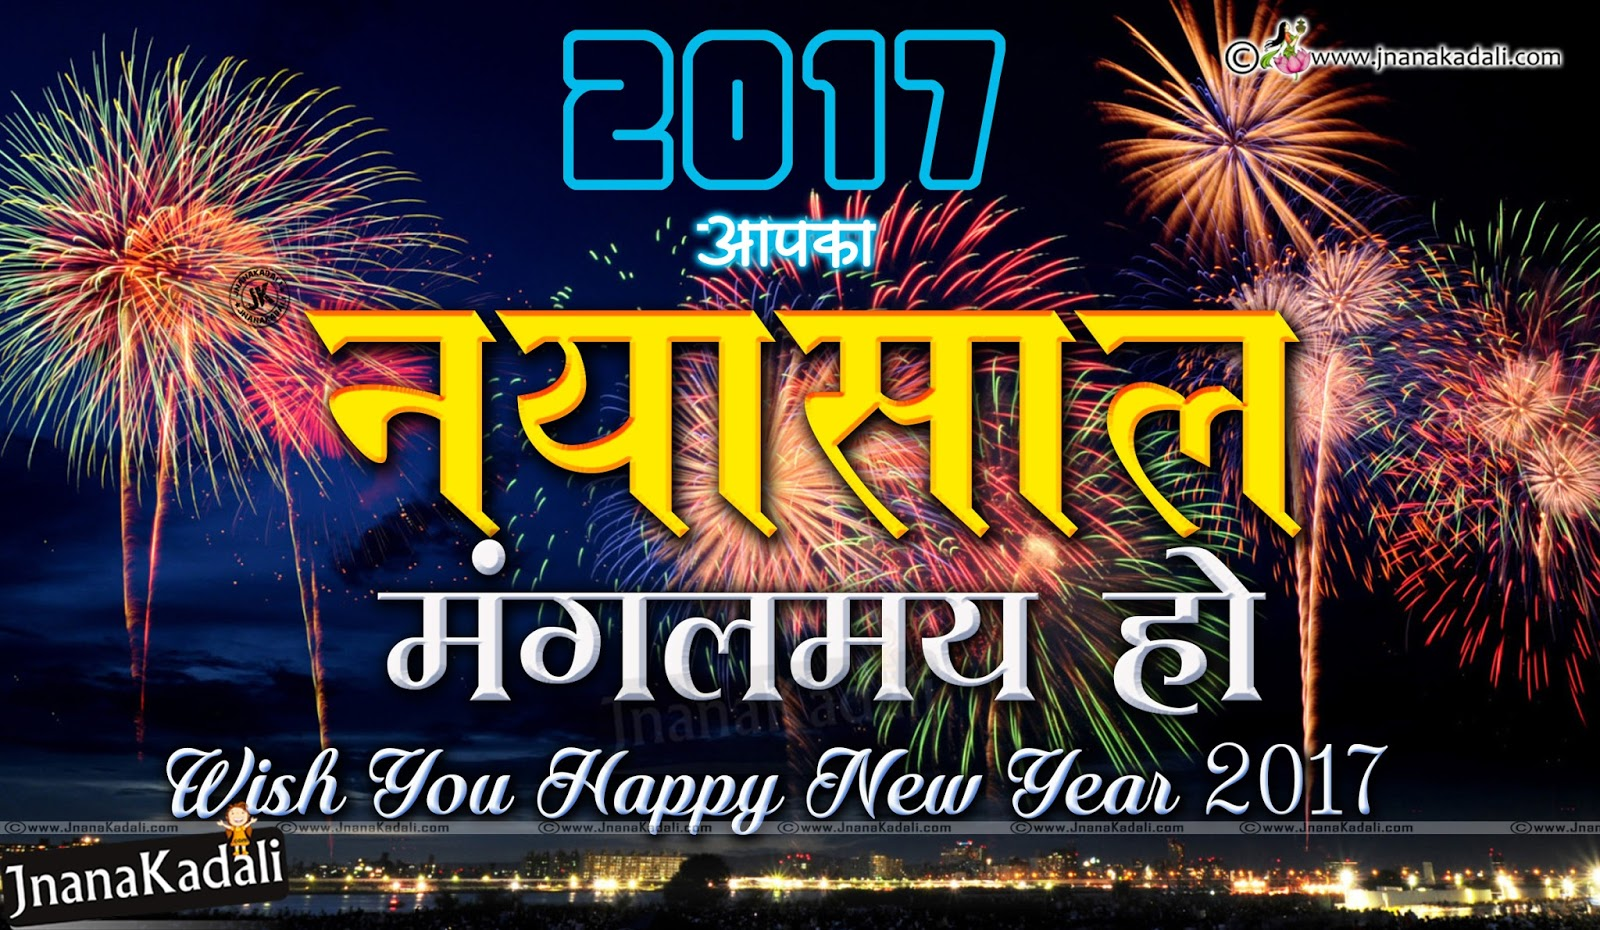 Hindi New Year Greetings With Hd Wallpapers Naya Saal Ki Mubaarak